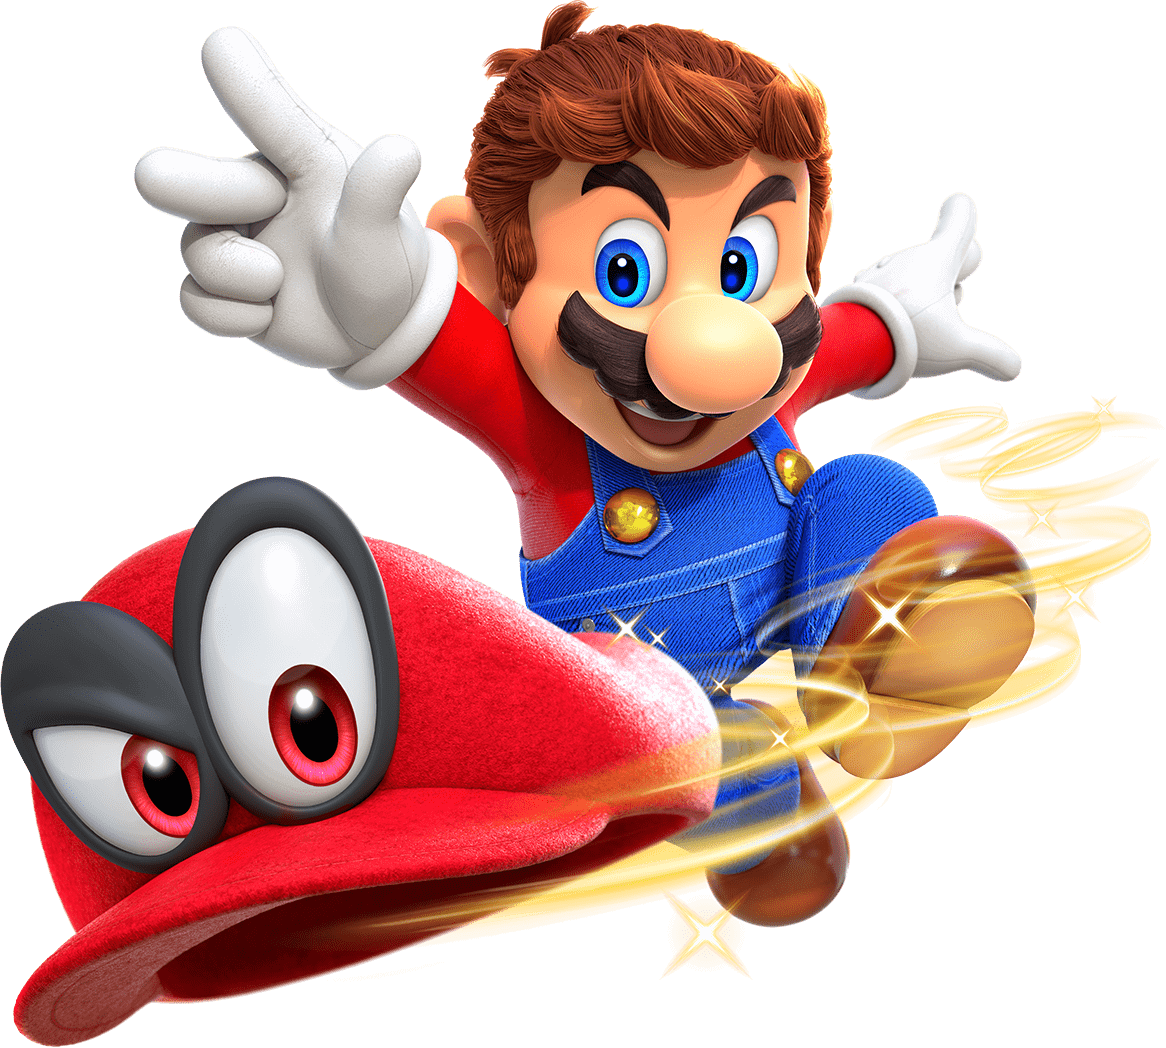 Mario clipart sad. Super odyssey nintendo switch